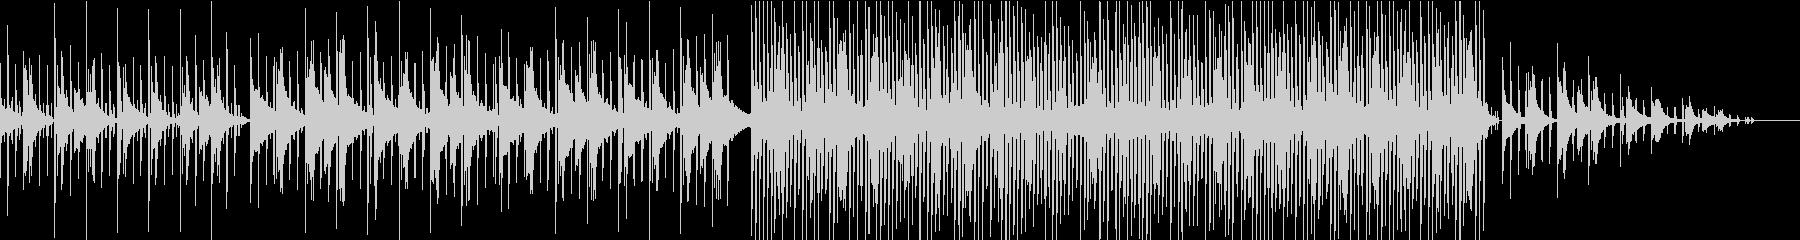 【Lofi hiphop】深夜の勉強にの未再生の波形